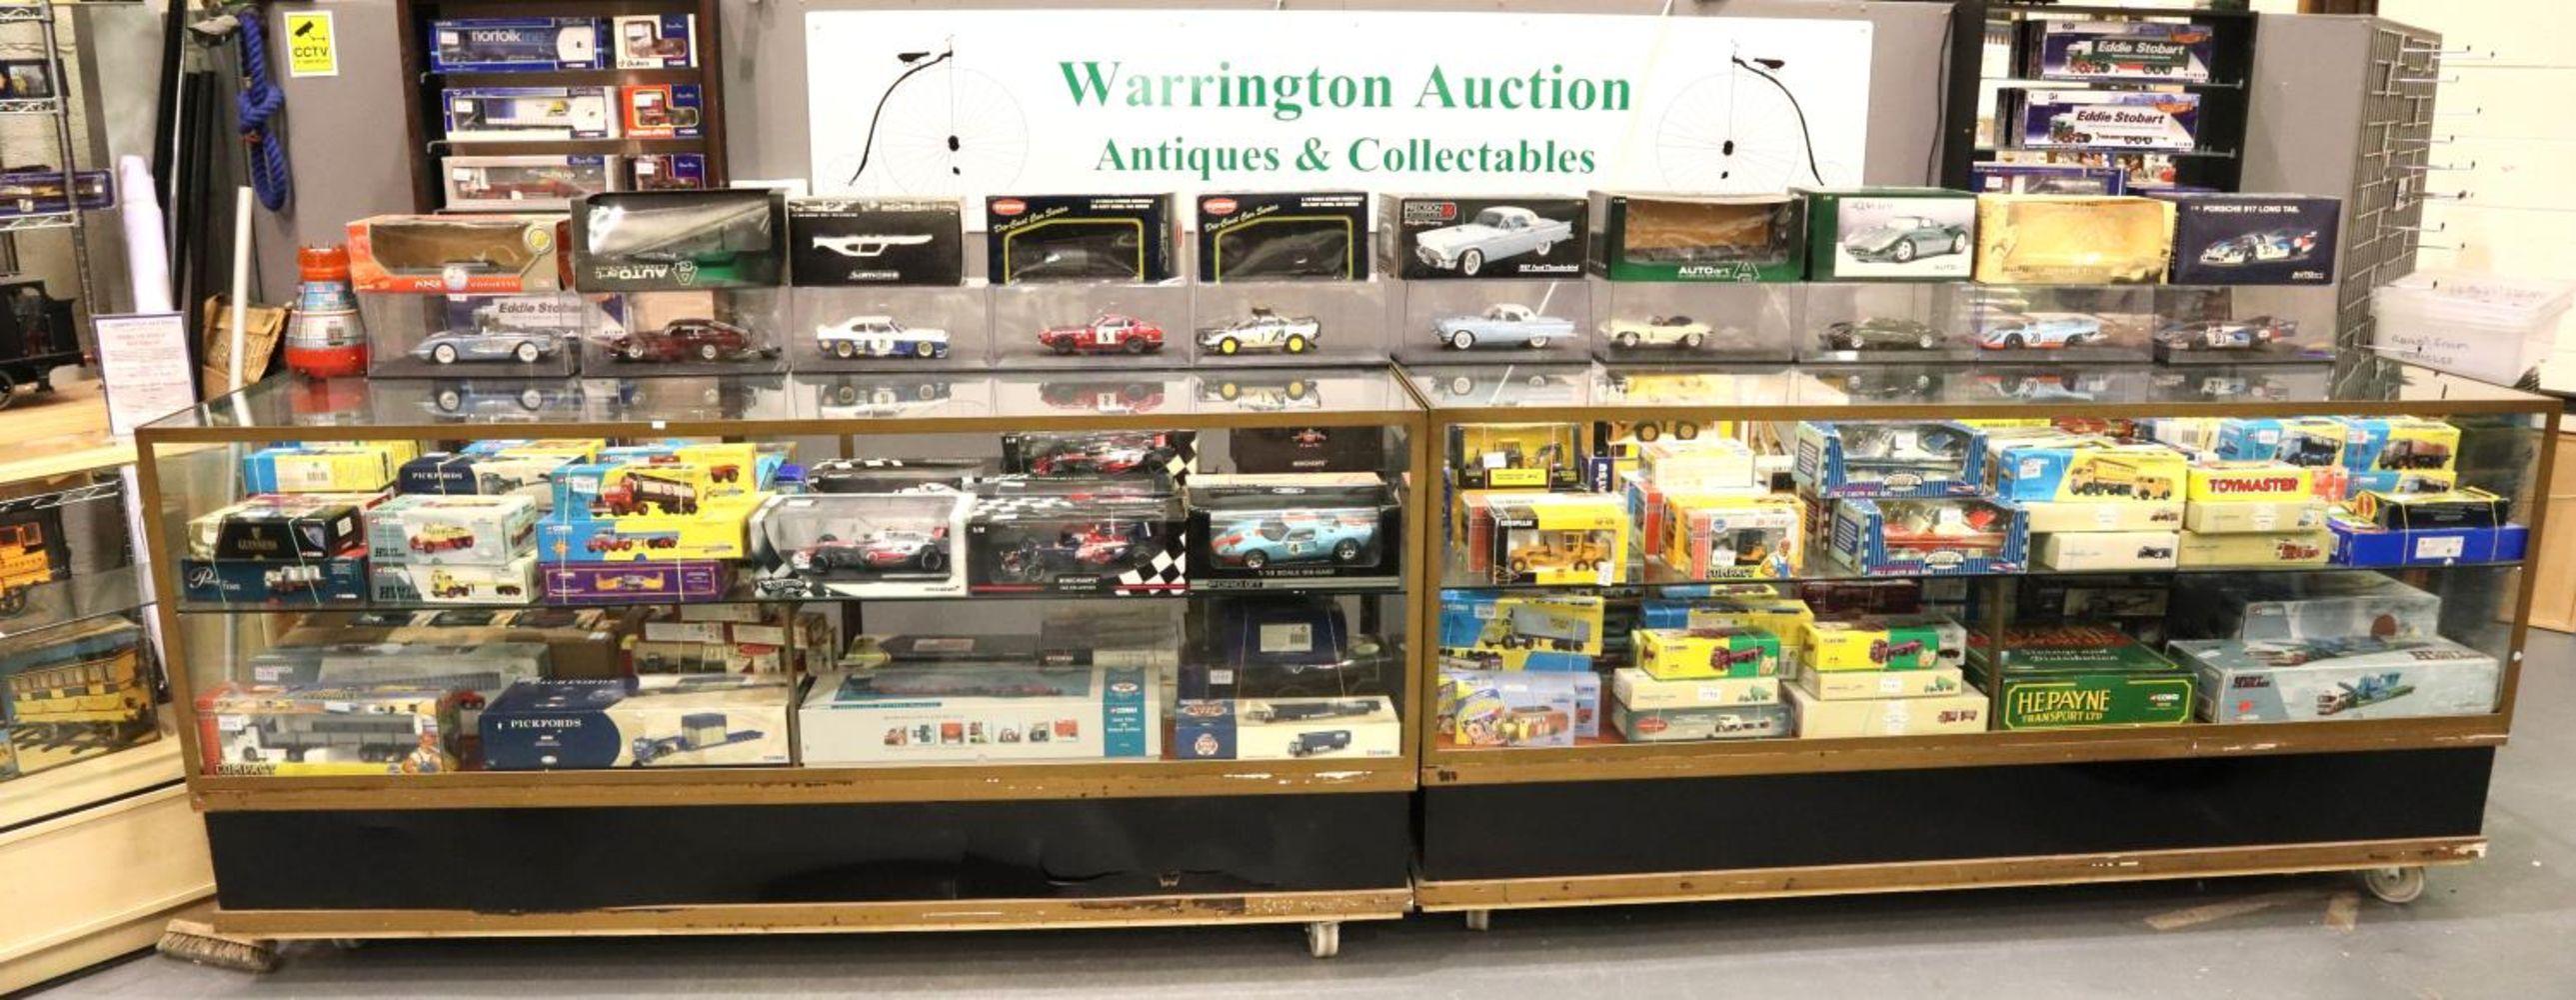 10AM START - Toy, Games & Transport Sale